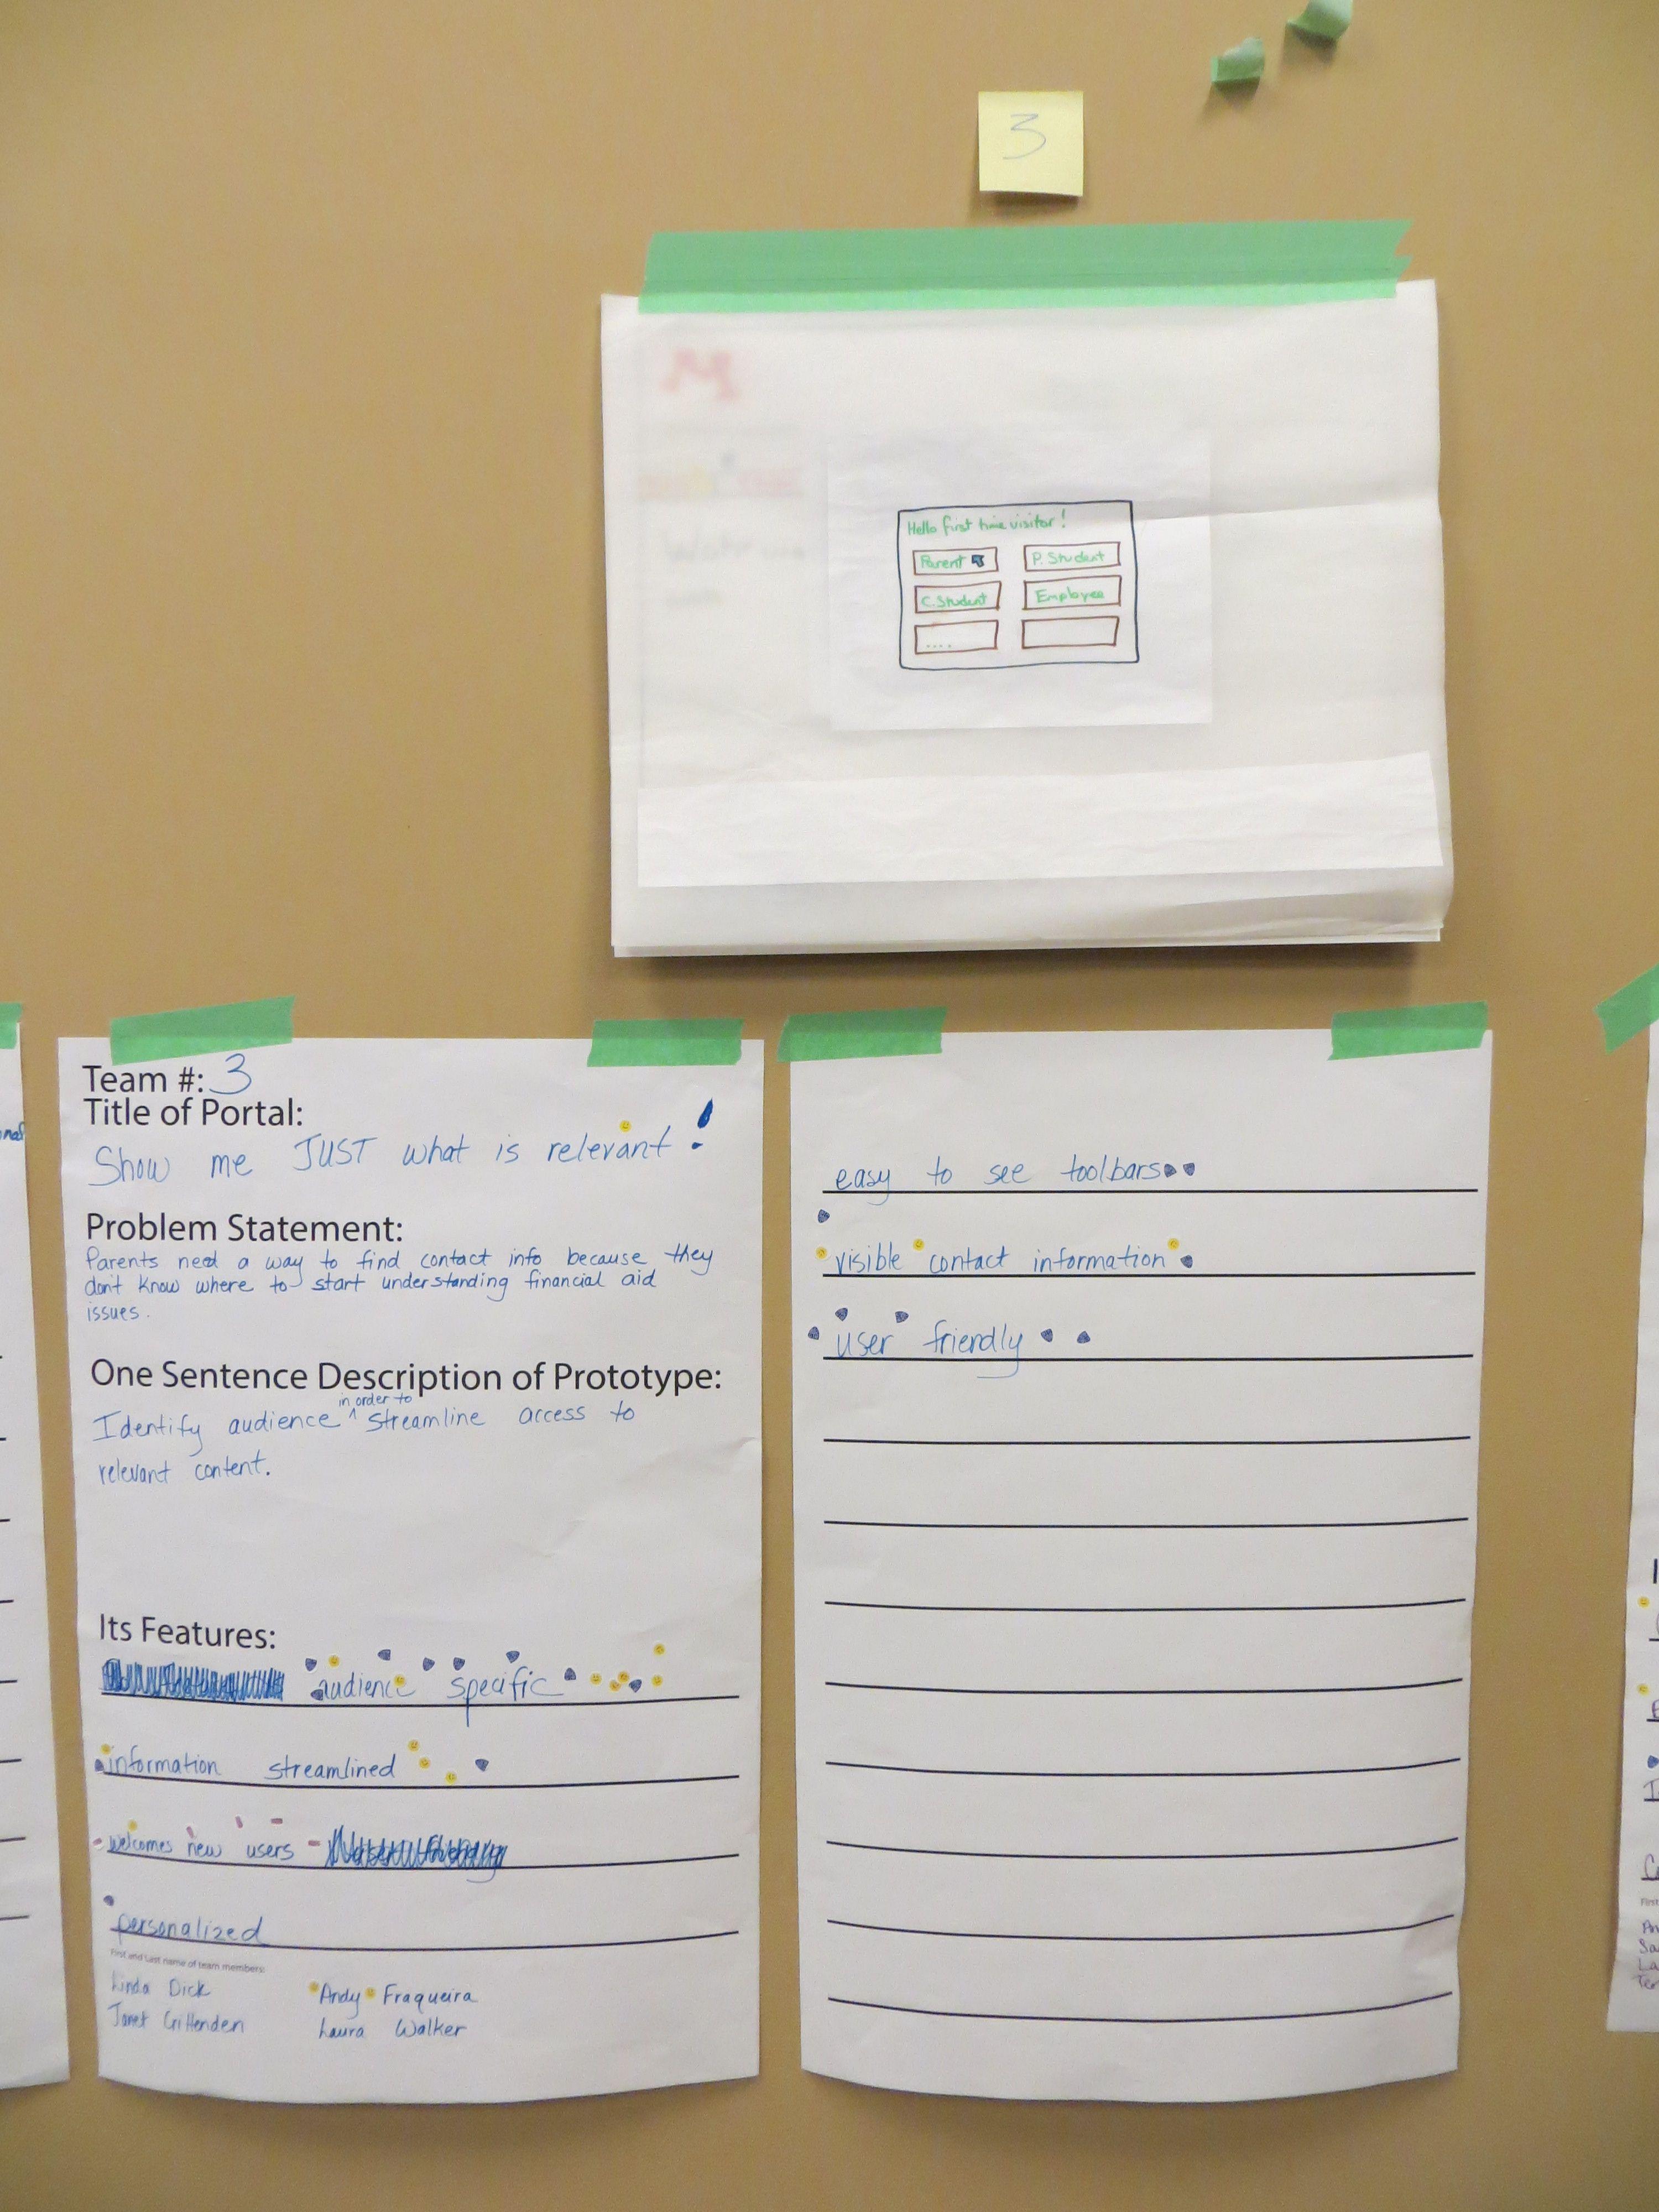 """Show me just what is relevant!"" April 9, 2013 - Team 3 https://docs.google.com/a/umn.edu/file/d/0B1WosPKeBxVKWThhWW9sZi1tWUE/edit http://youtu.be/Kdu2OfbVZG8"